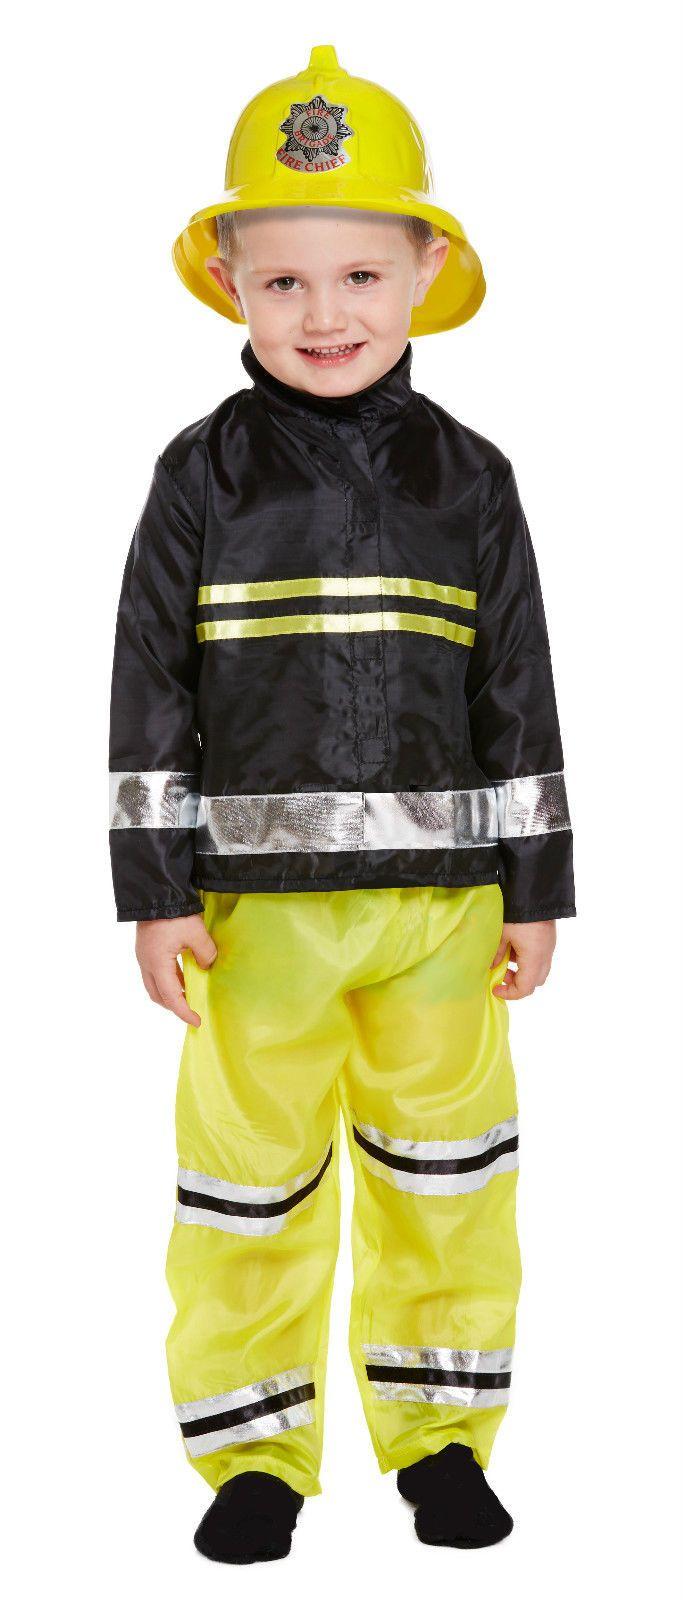 BOYS TODDLER KIDS FIREMAN FIRE FIGHTER FANCY DRESS OUTFIT COSTUME 2 - 4 YEARS   | eBay